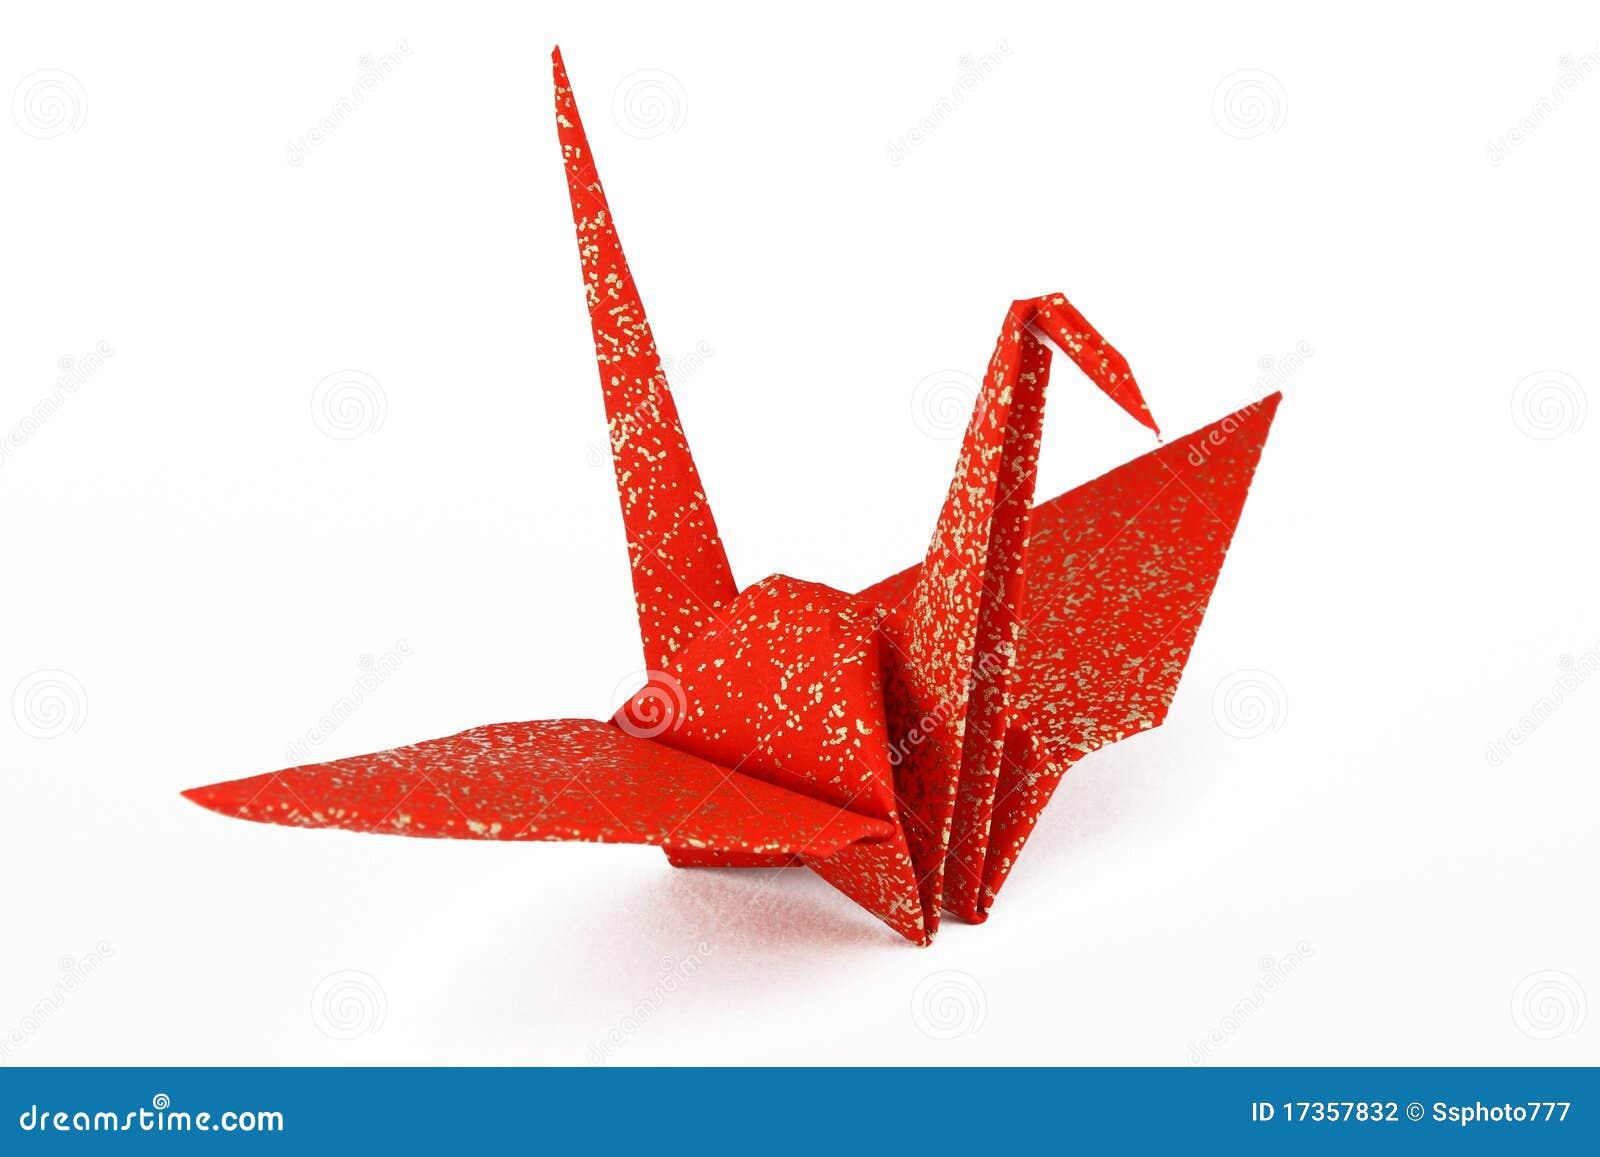 Origami Crane Clip Art Red and gold origami crane